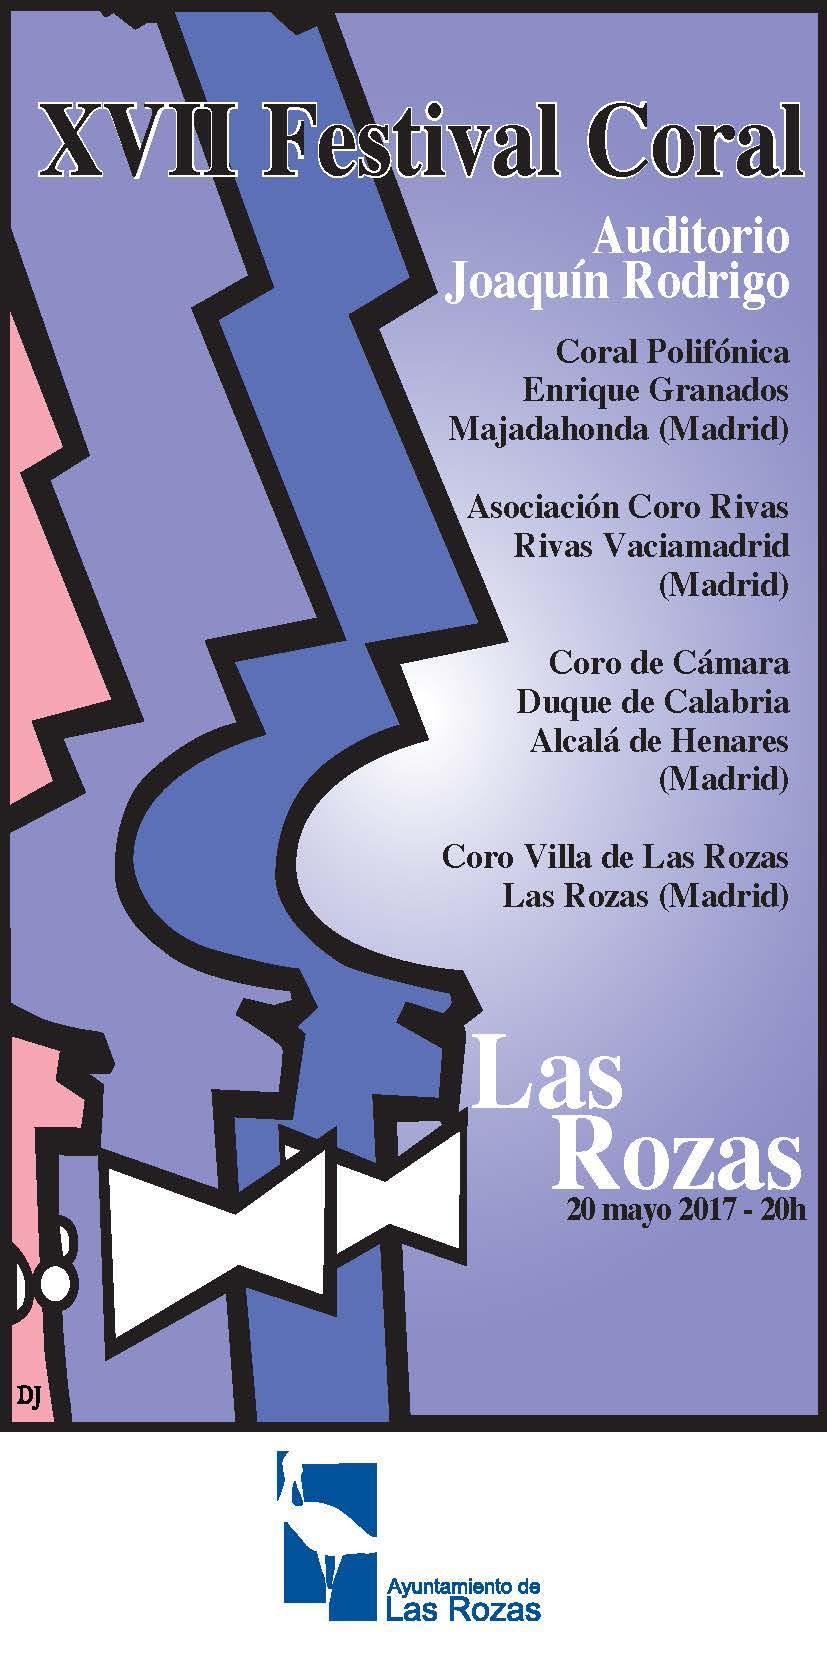 xvii festival coral_Página_1